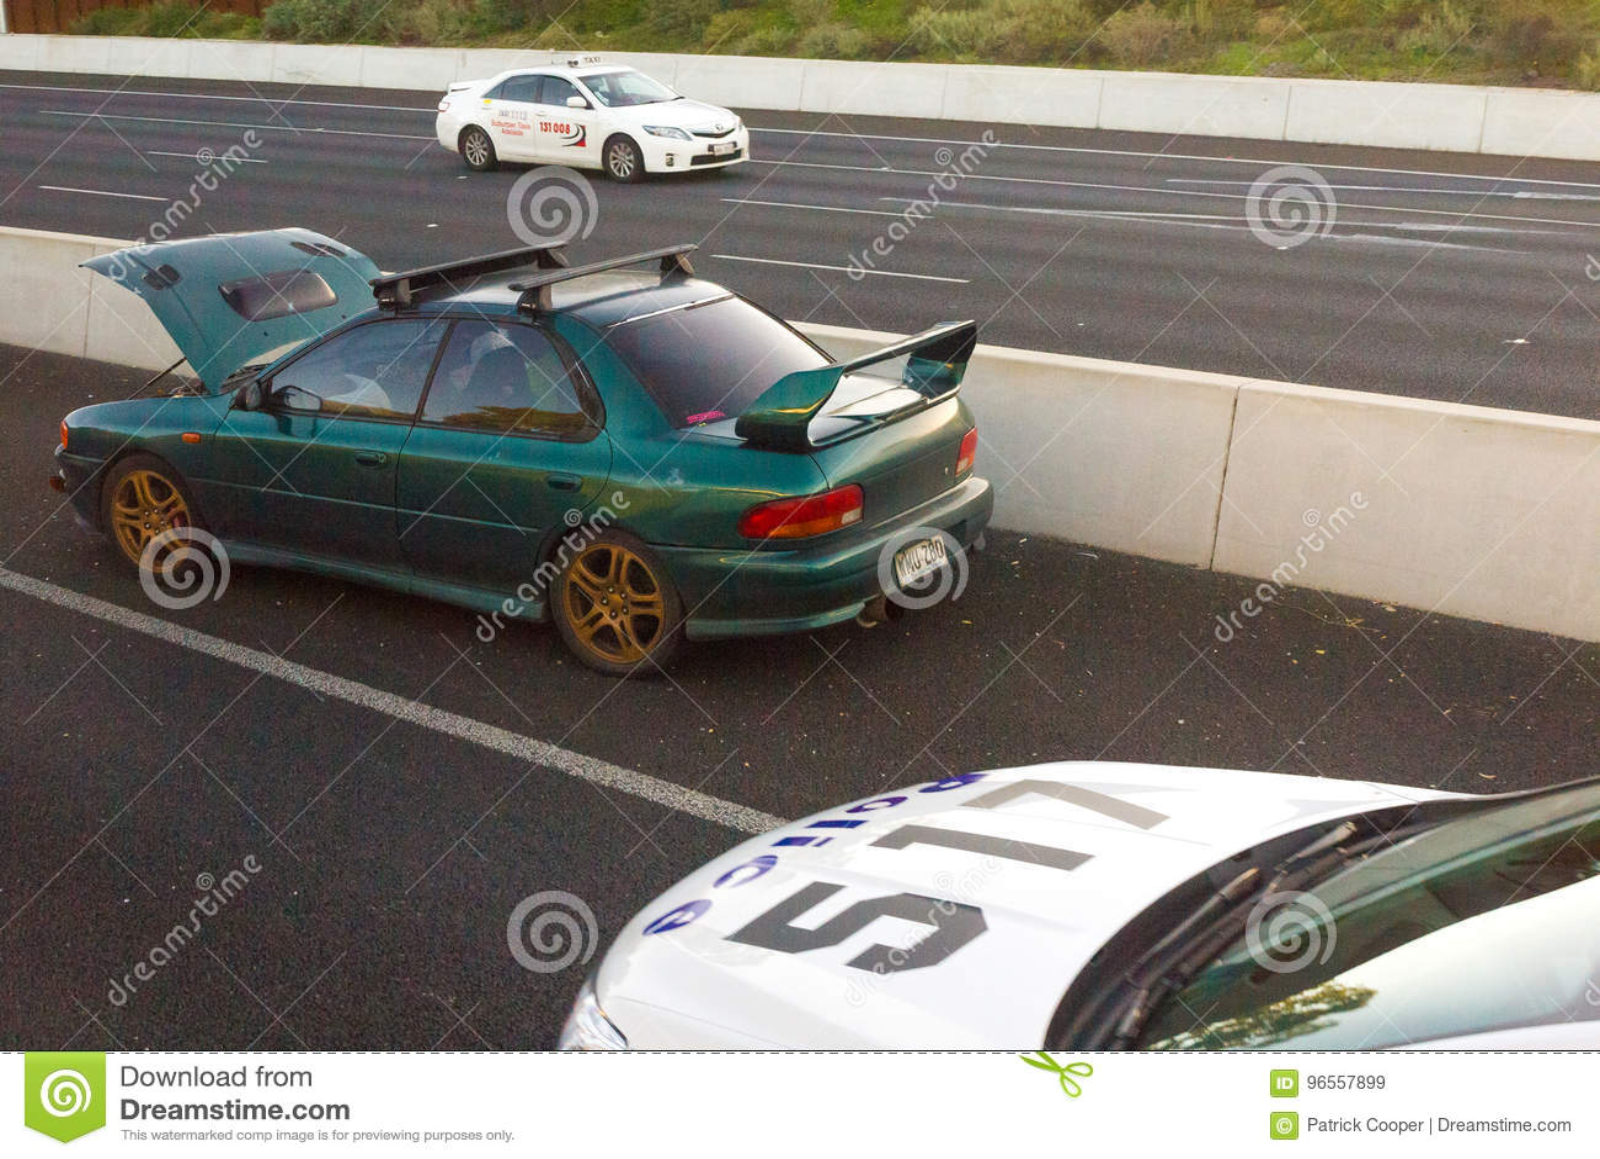 Car Crash On Southern Expressway, South Australia Editorial Stock